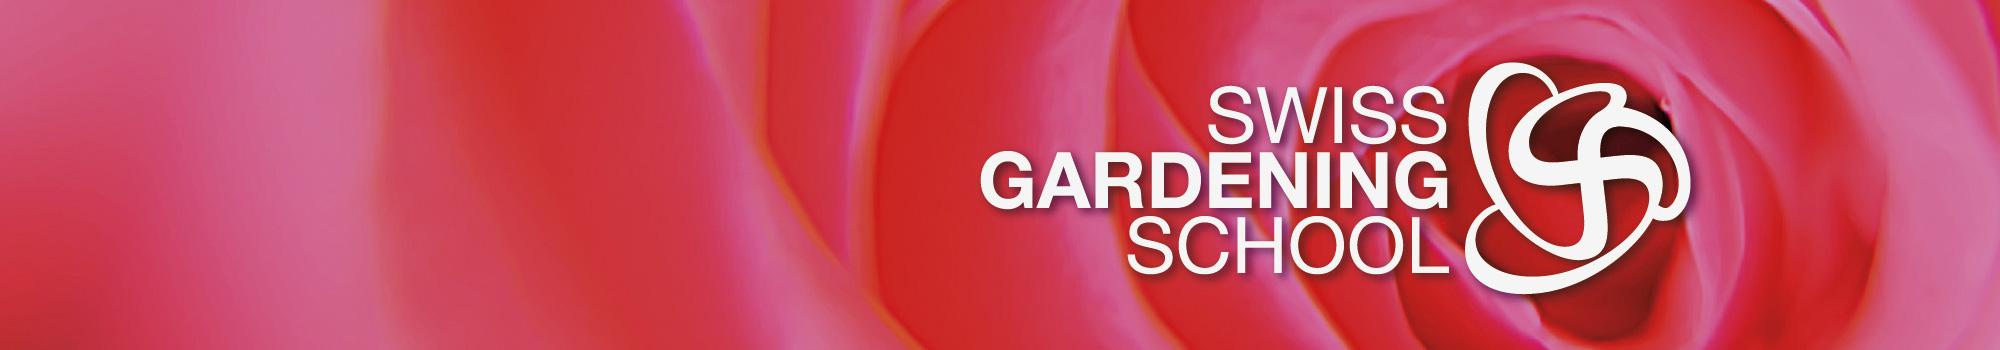 Slide-swiss-gardening